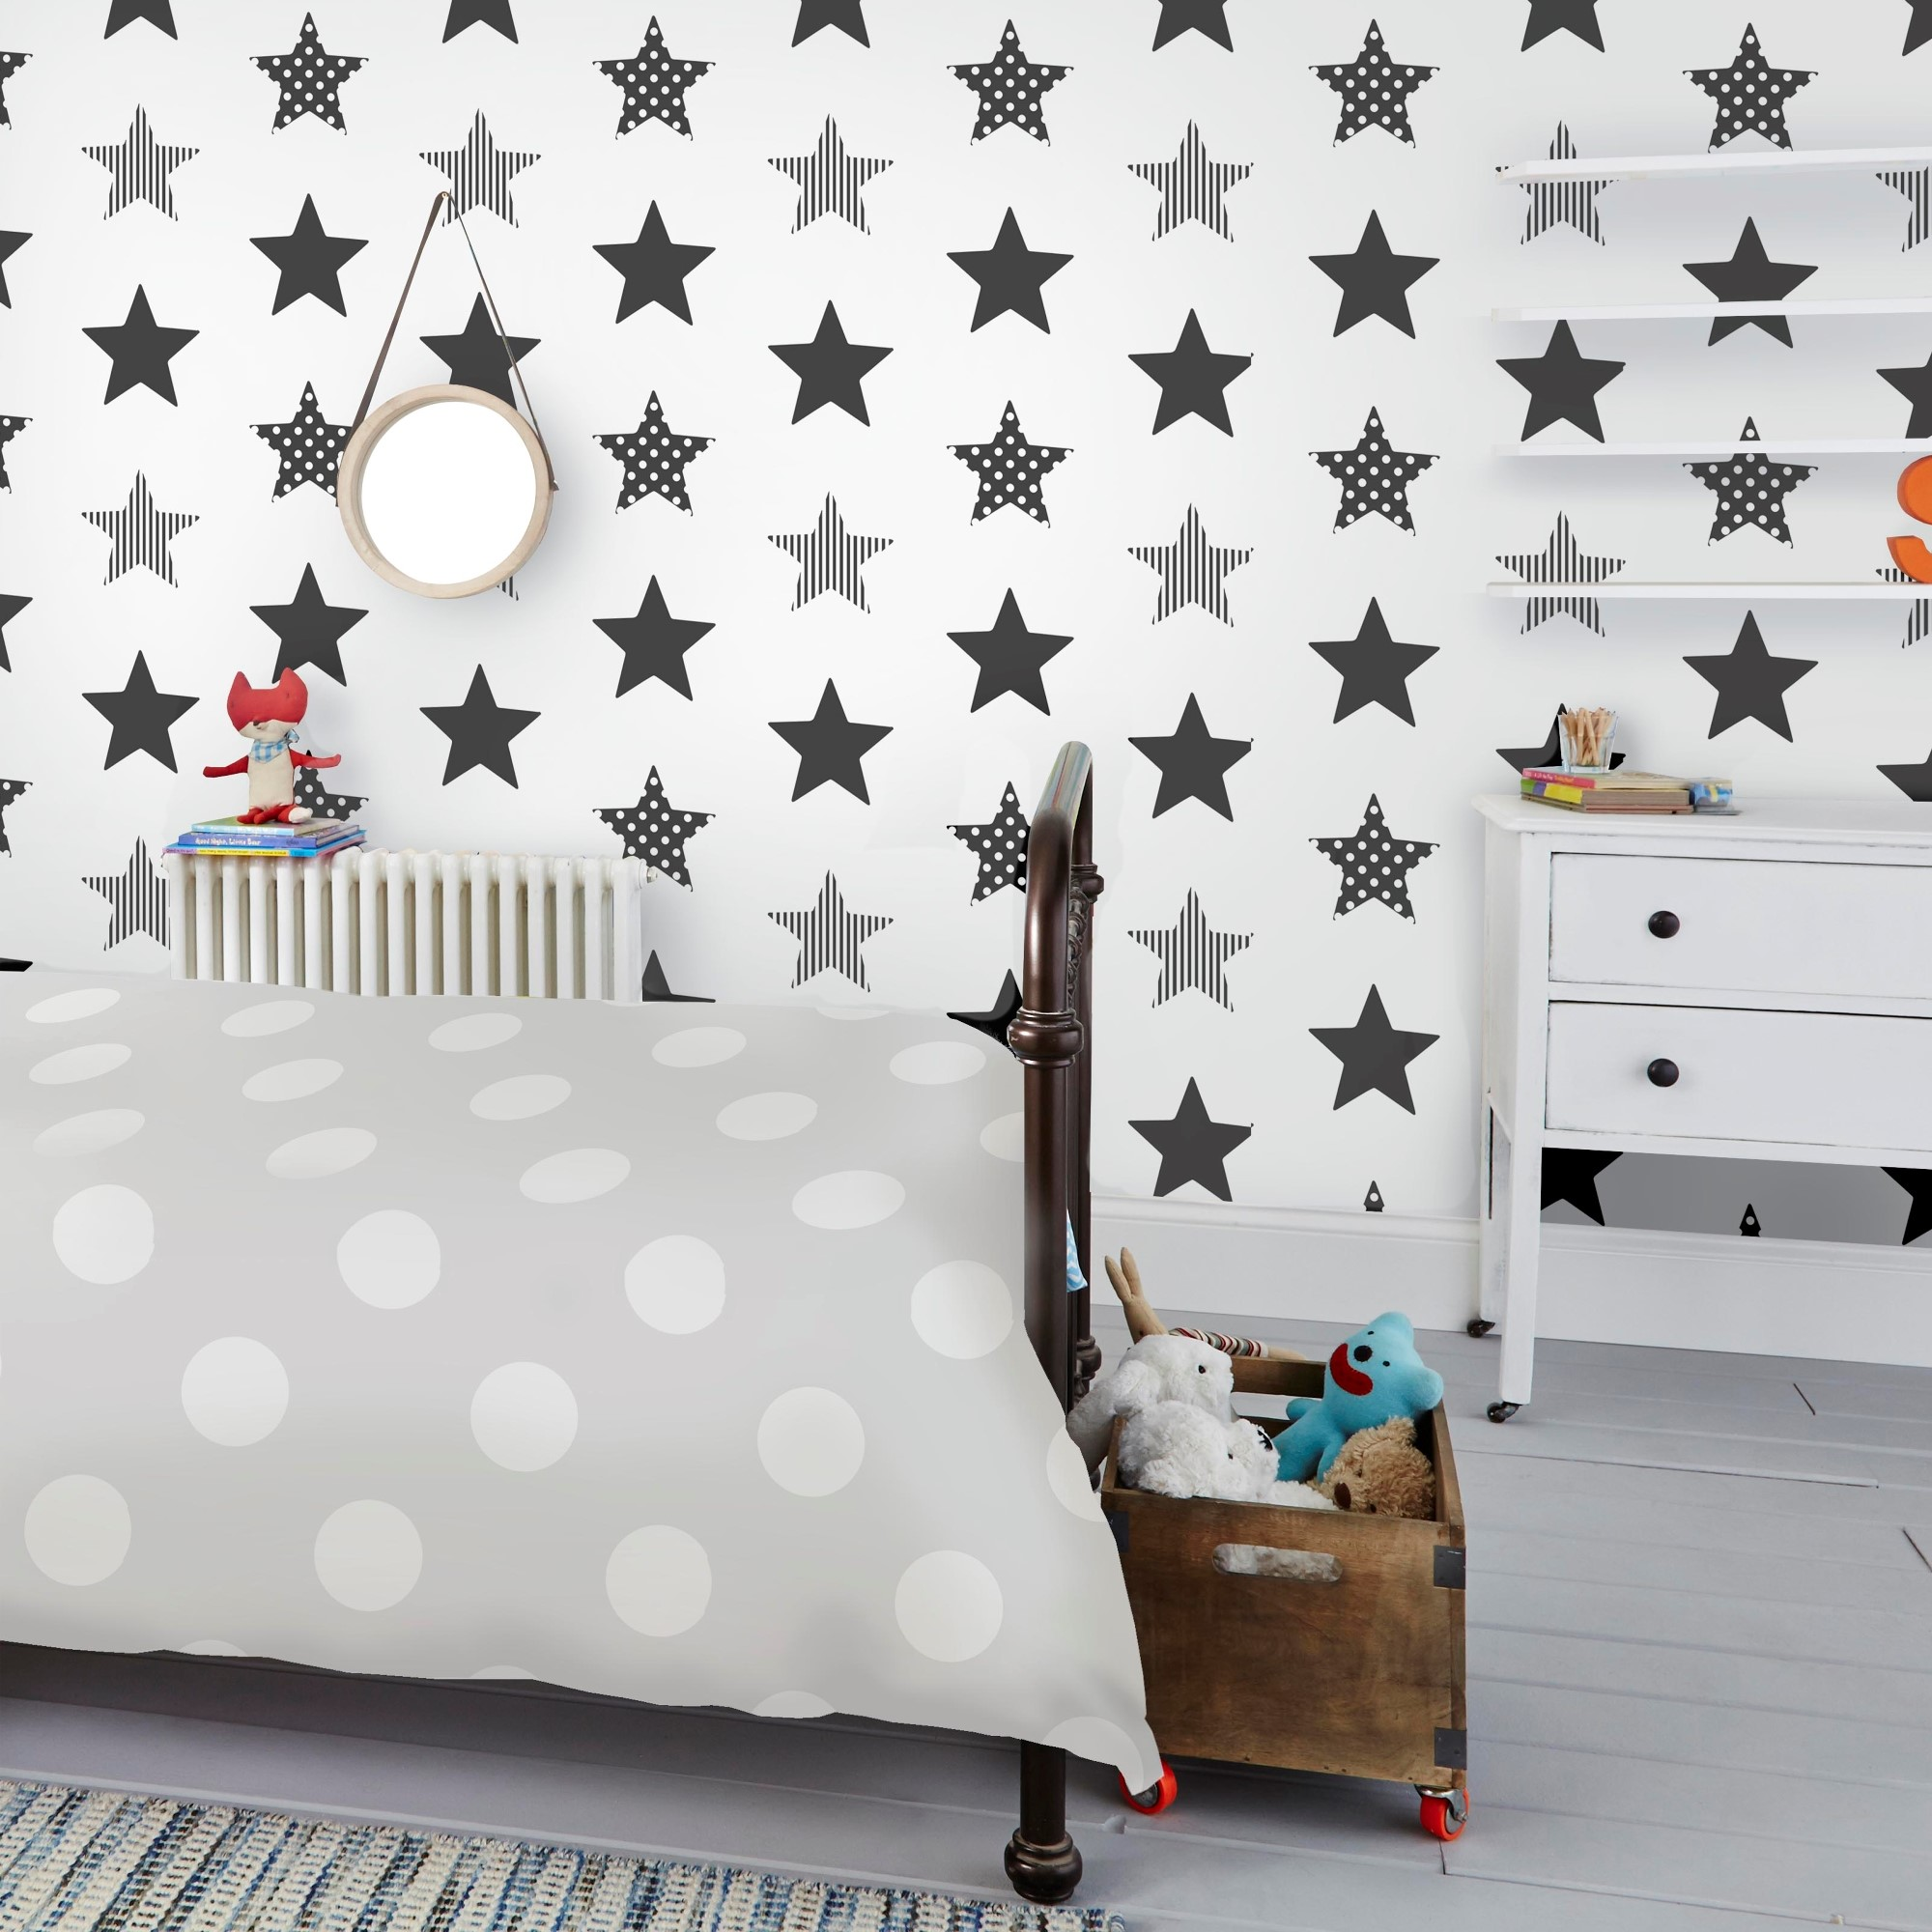 Papier peint intissé étoiles superstar noir blanc 1005x52cm